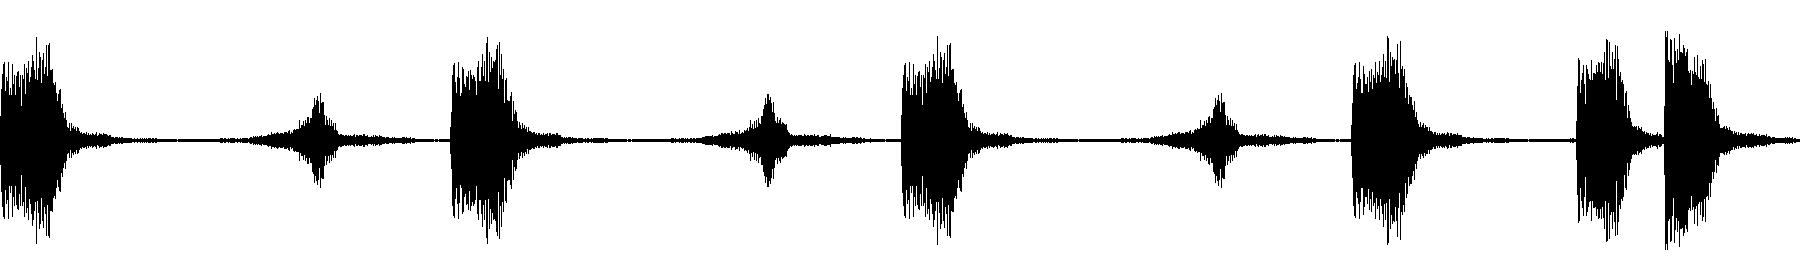 pth synth 12